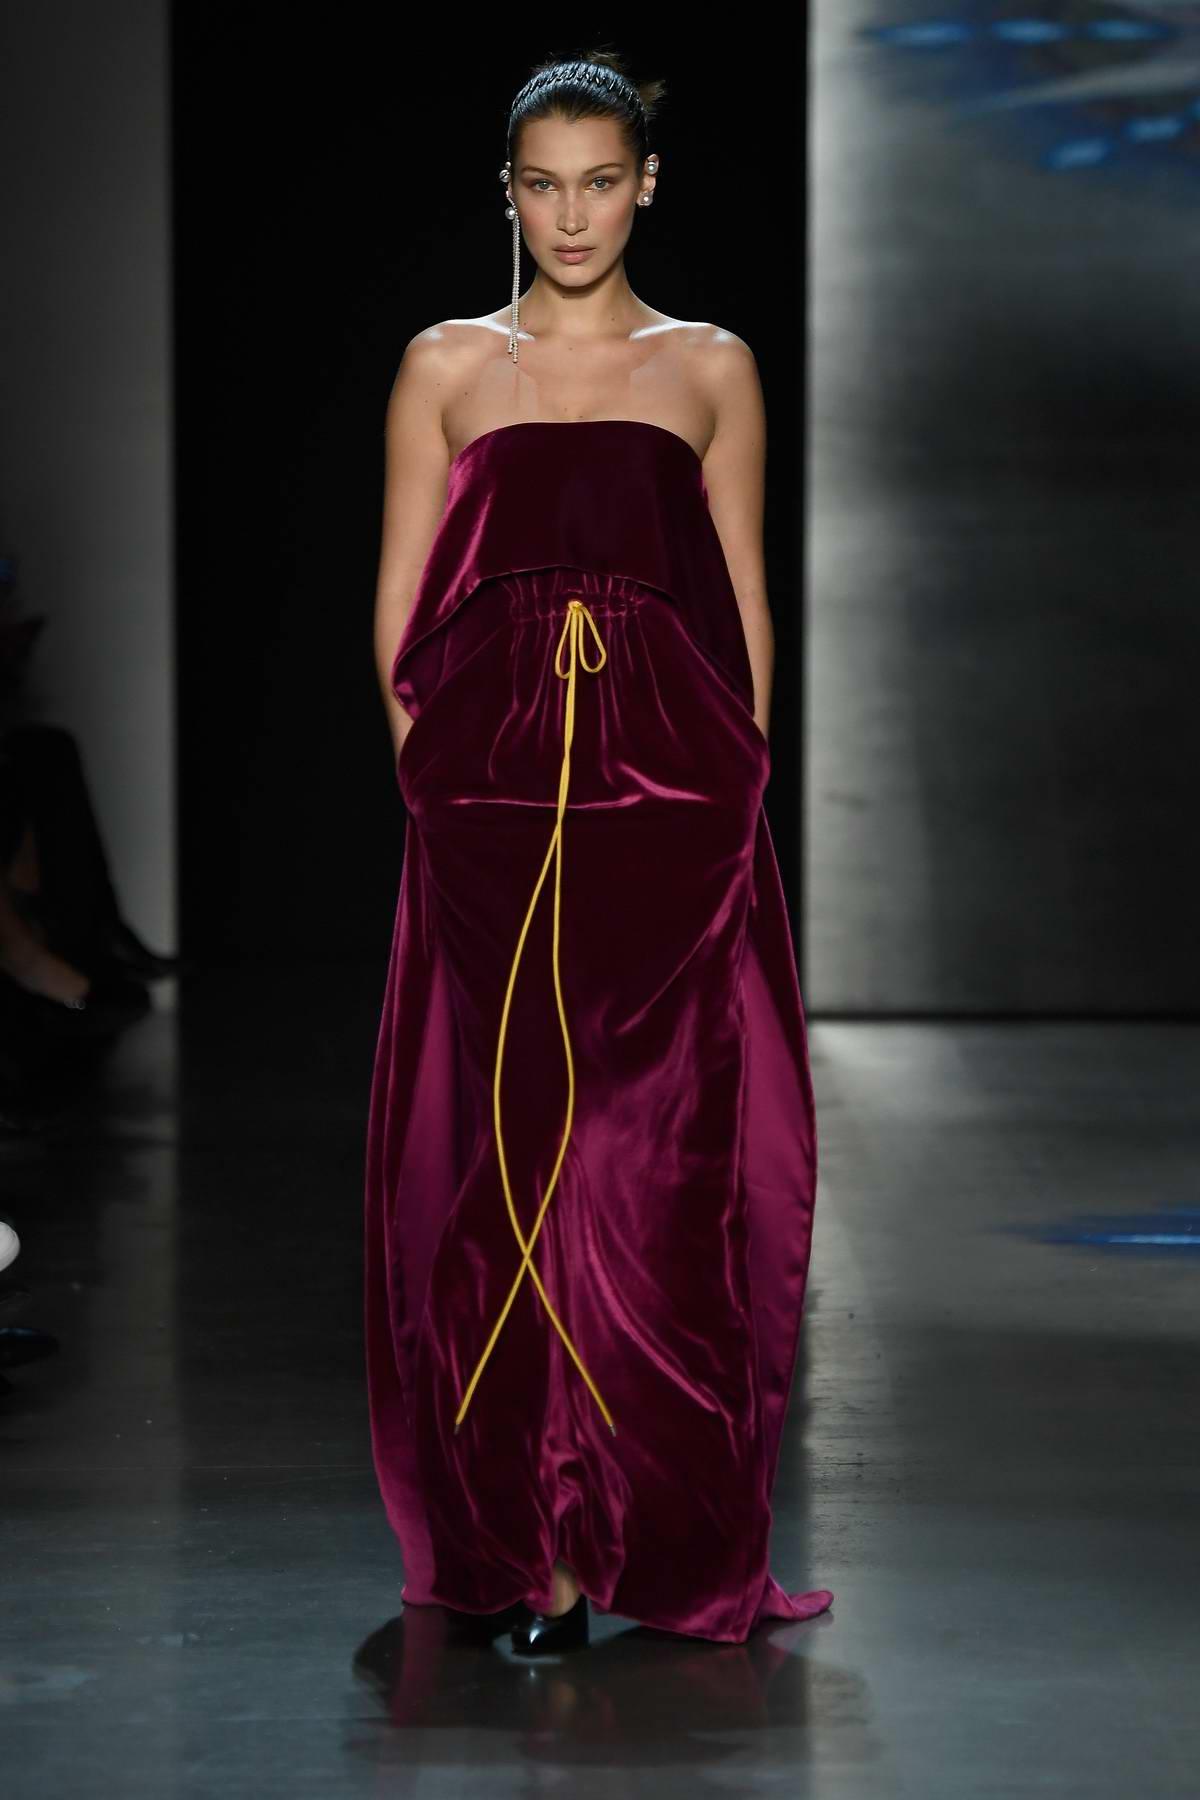 Bella Hadid walks for Prabal Gurung Show, Fall/Winter 2018 during New York Fashion Week in New York City